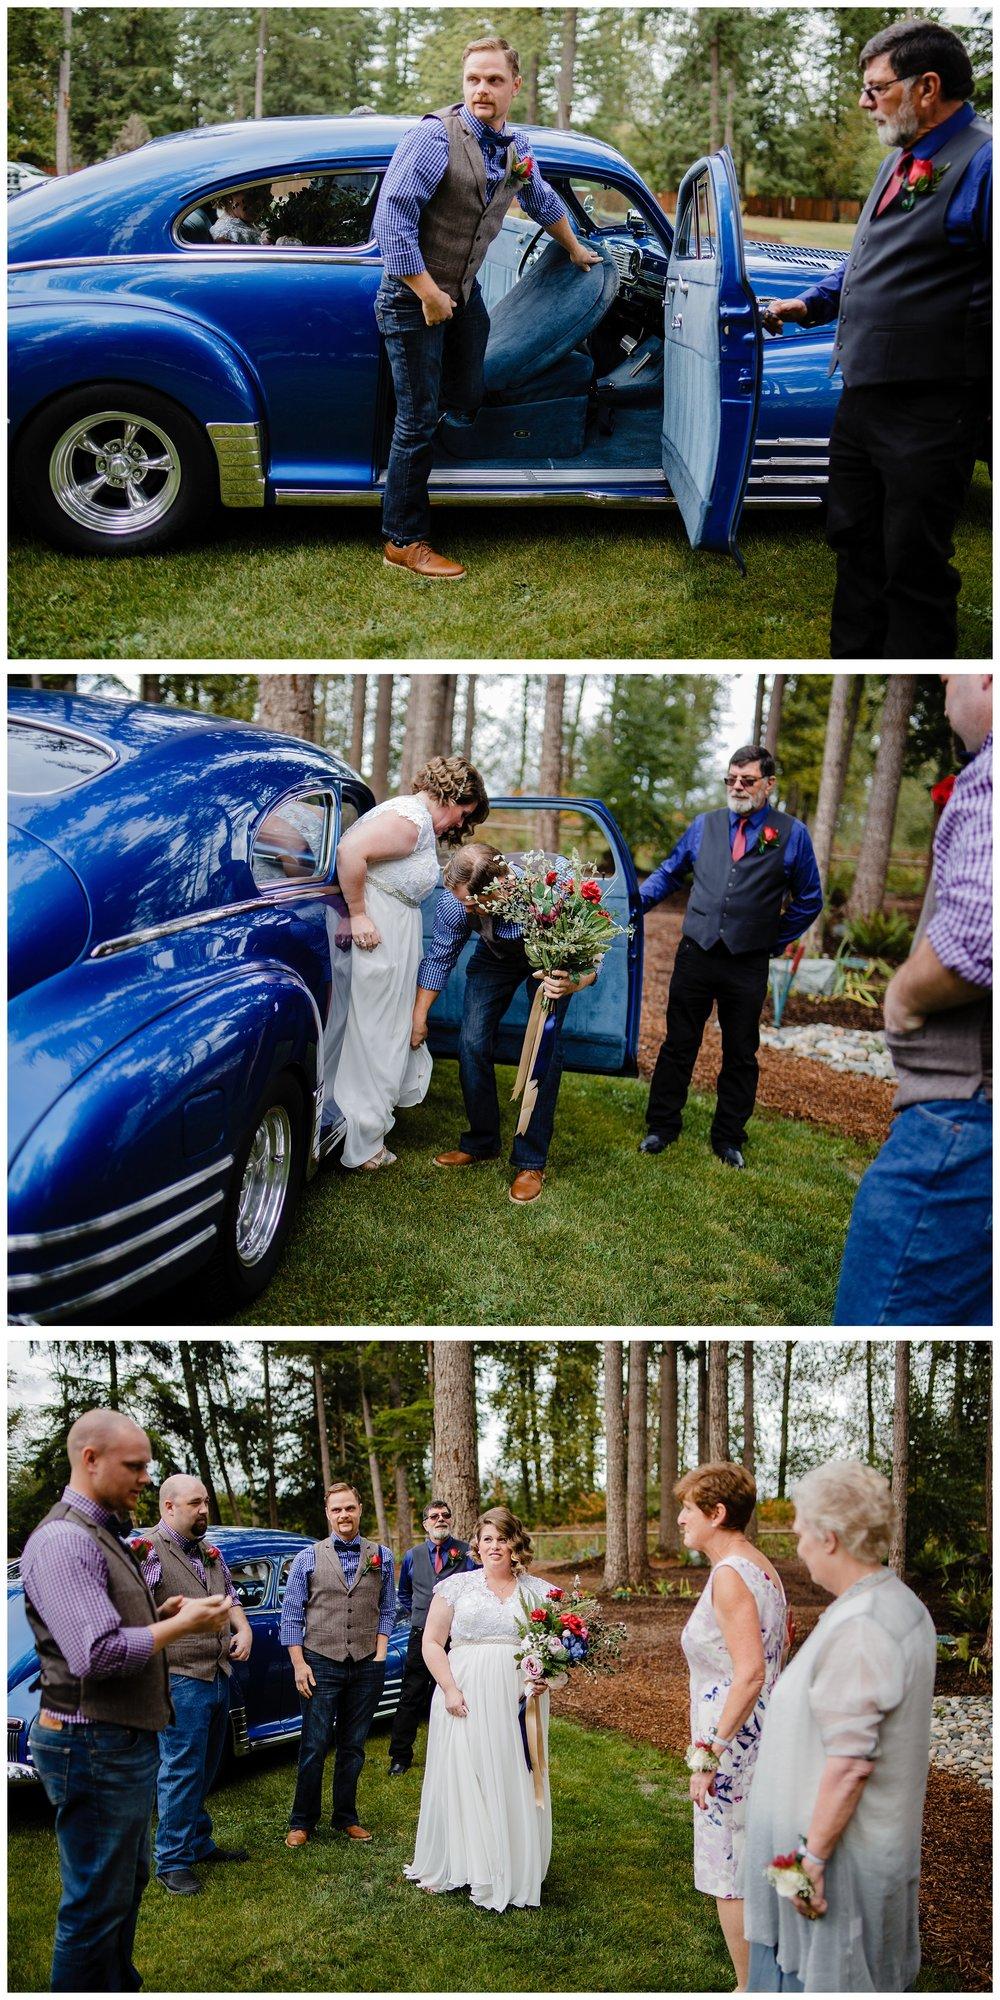 Aldergrove Park Fall Backyard Wedding Photographer Pregnant Bride Tent Outdoor BC Canada Best Wedding Photographer_0034.jpg